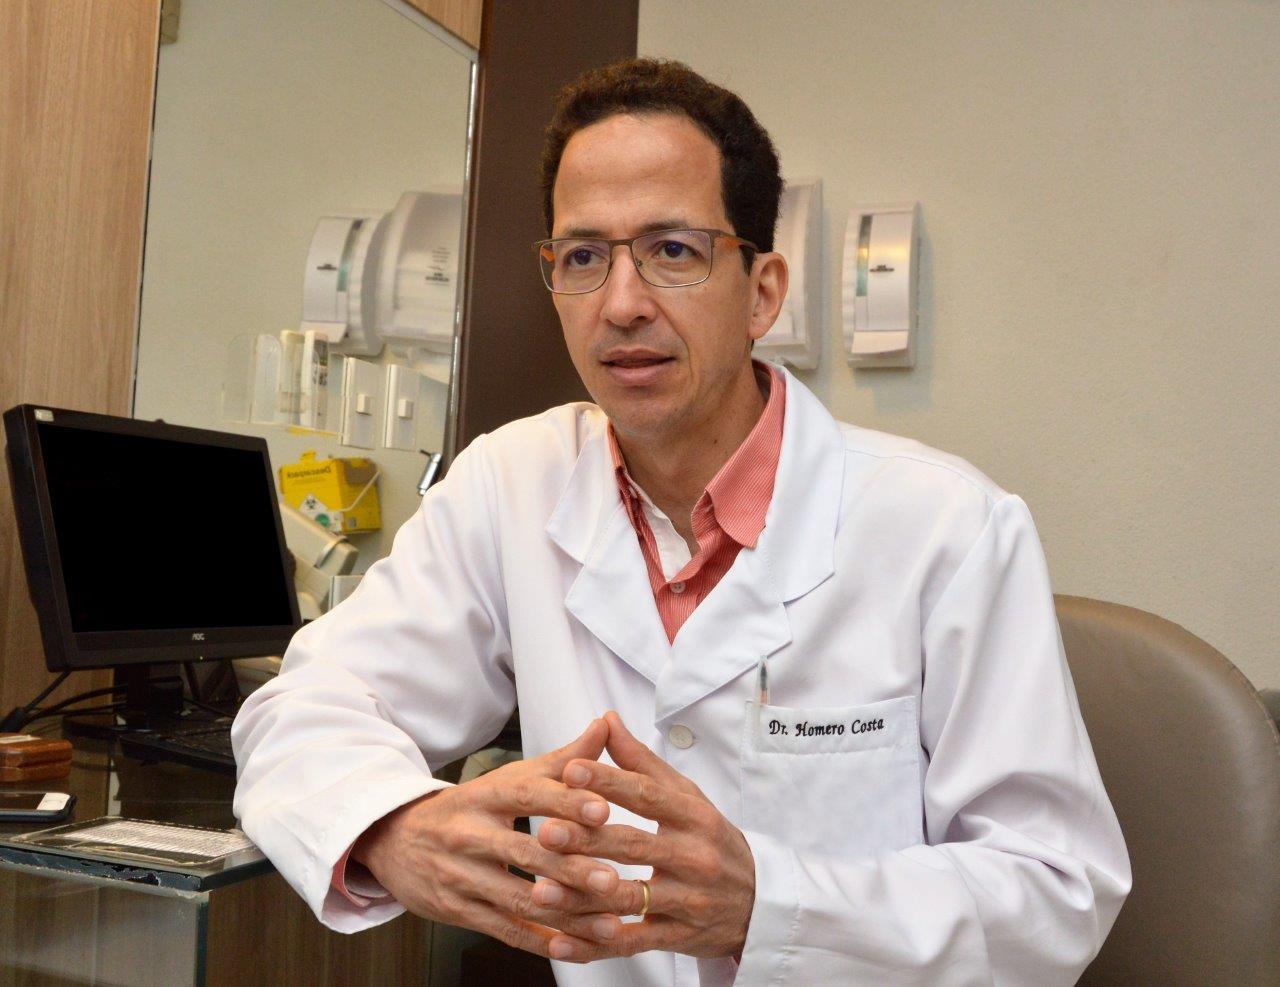 ... Oftalmologista alerta sobre os riscos de usar óculos de sol falsificados ffe4aa7e3b